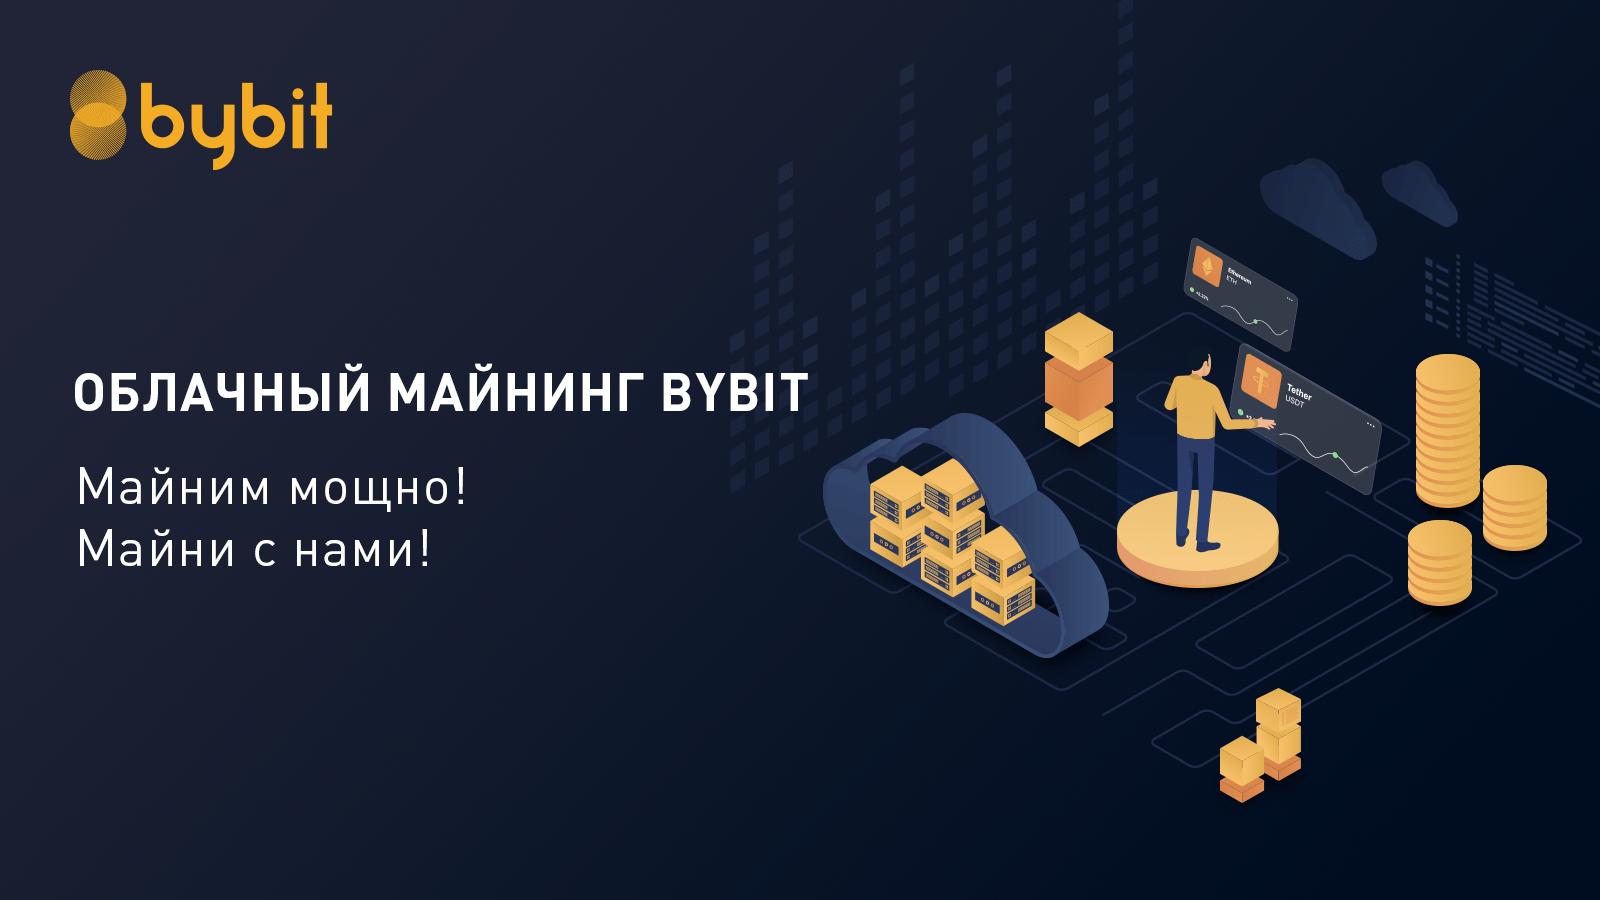 Bybit создает сервис облачного майнинга Ethereum